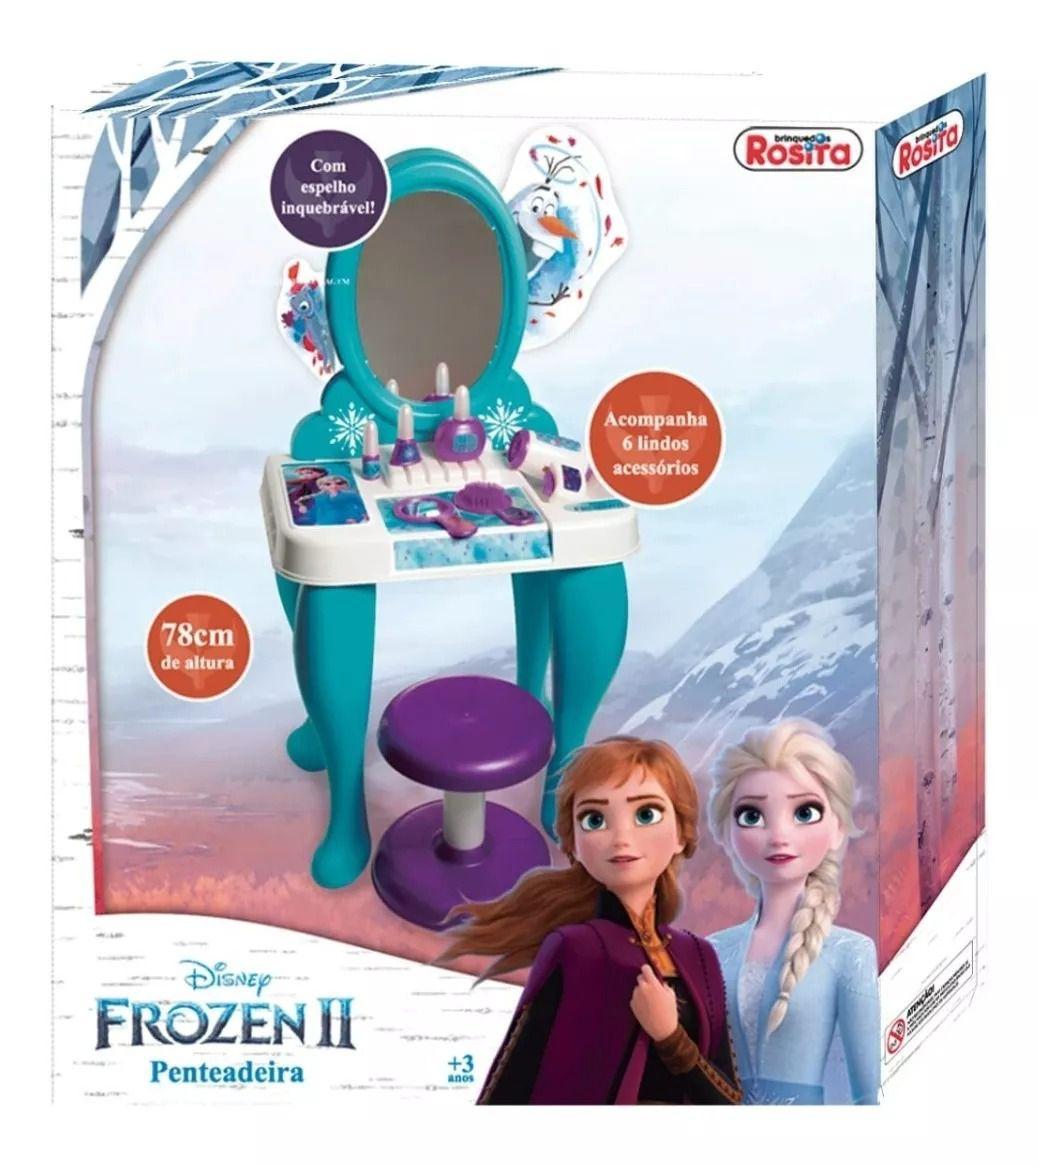 Penteadeira Infantil Frozen 2 Com Acessórios 78cm - Rosita